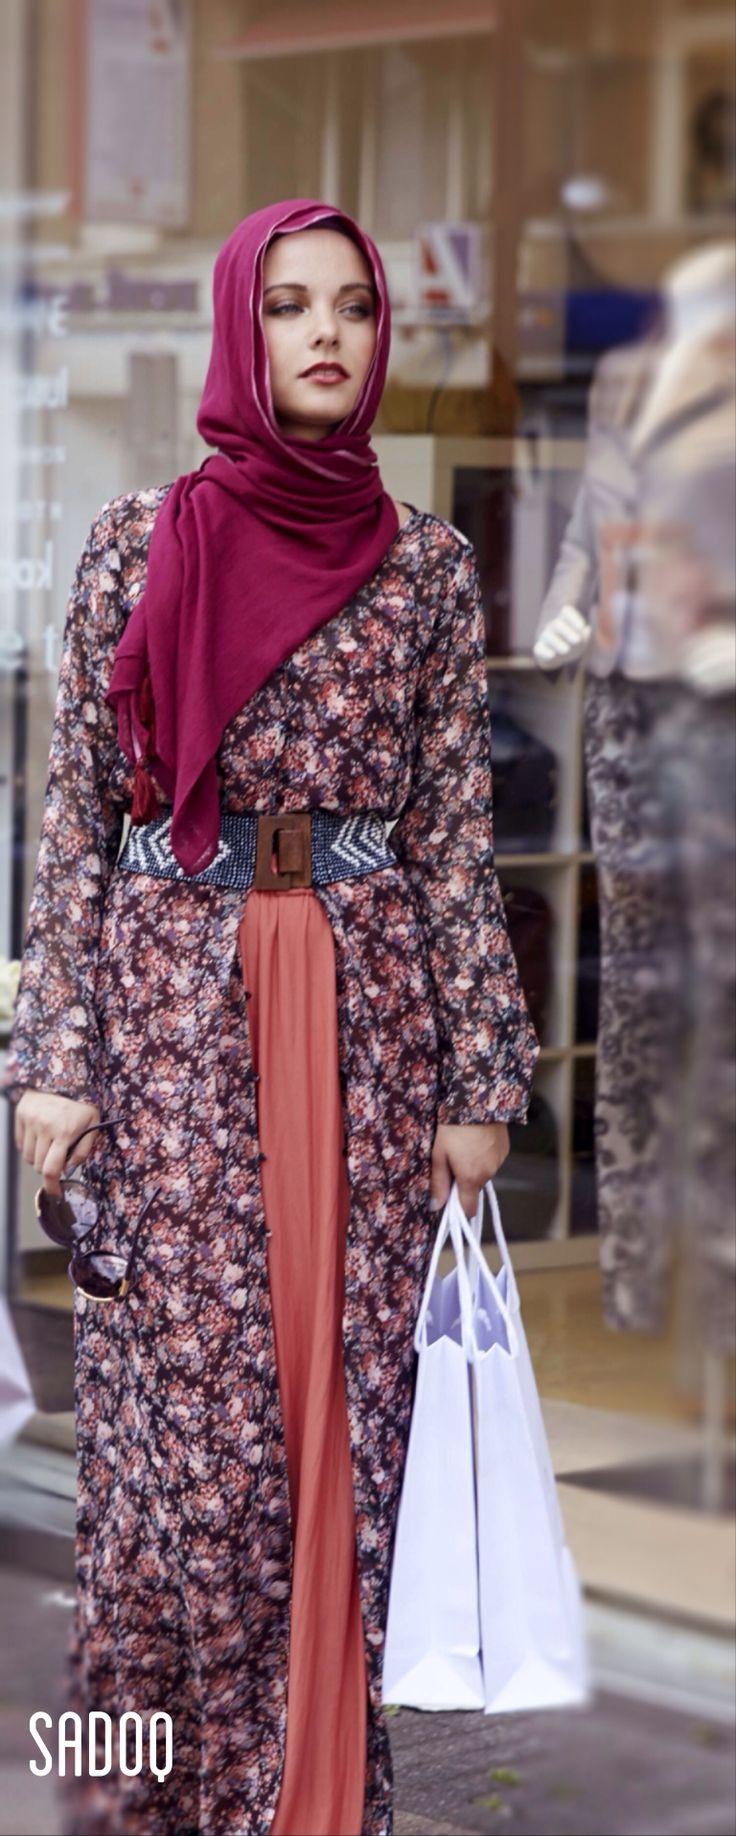 A SADOQ woman loves to shop